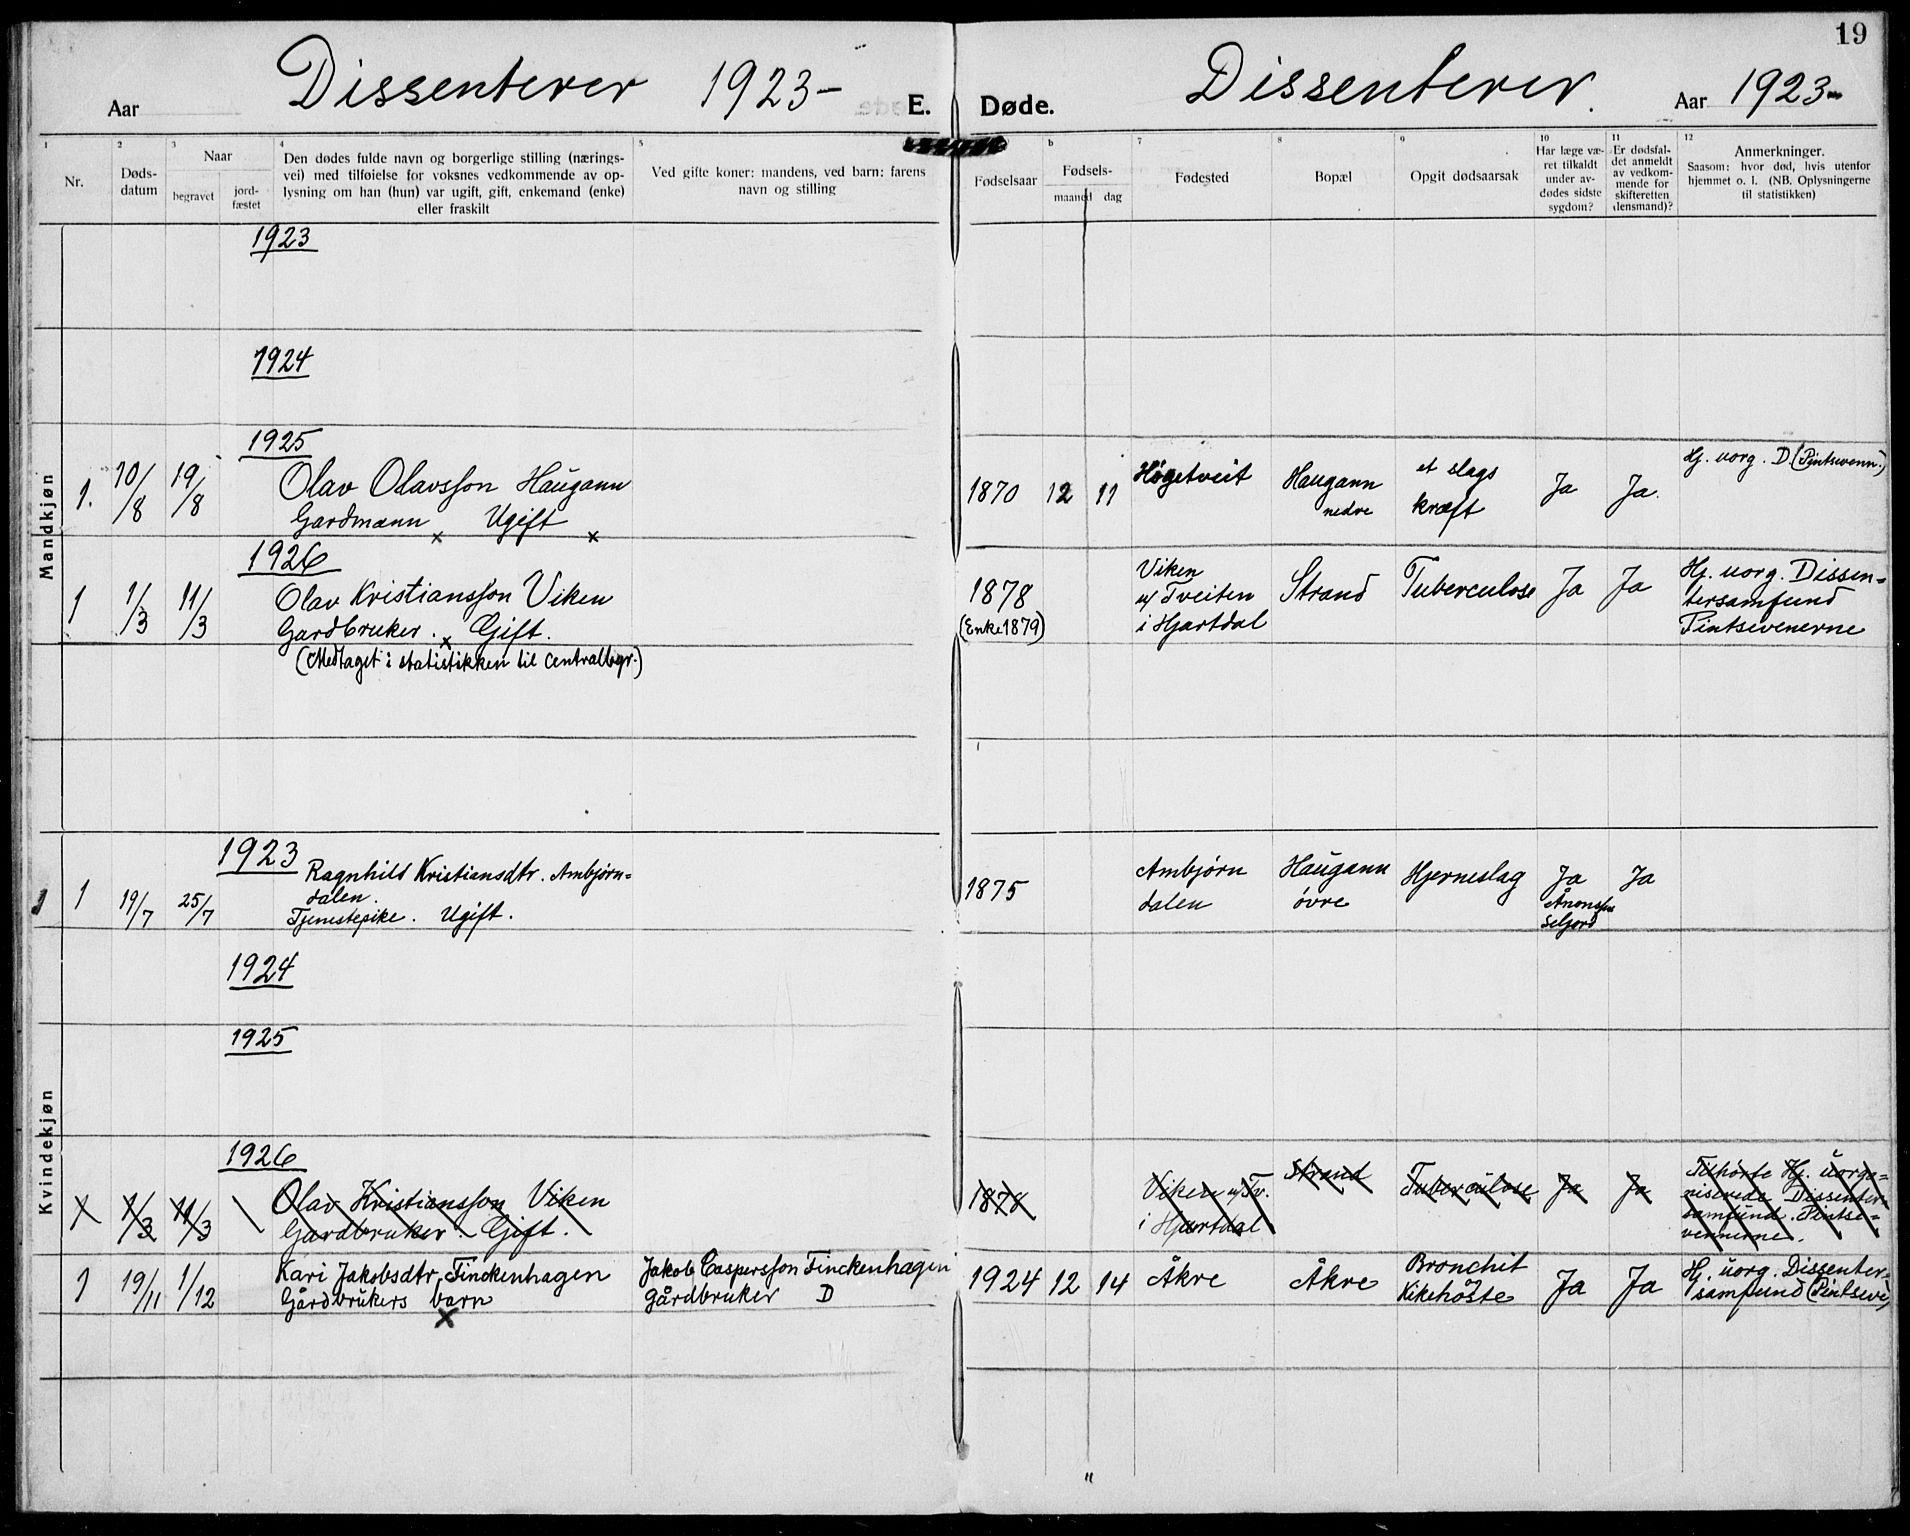 SAKO, Hjartdal kirkebøker, F/Fa/L0012: Ministerialbok nr. I 12, 1923-1930, s. 19